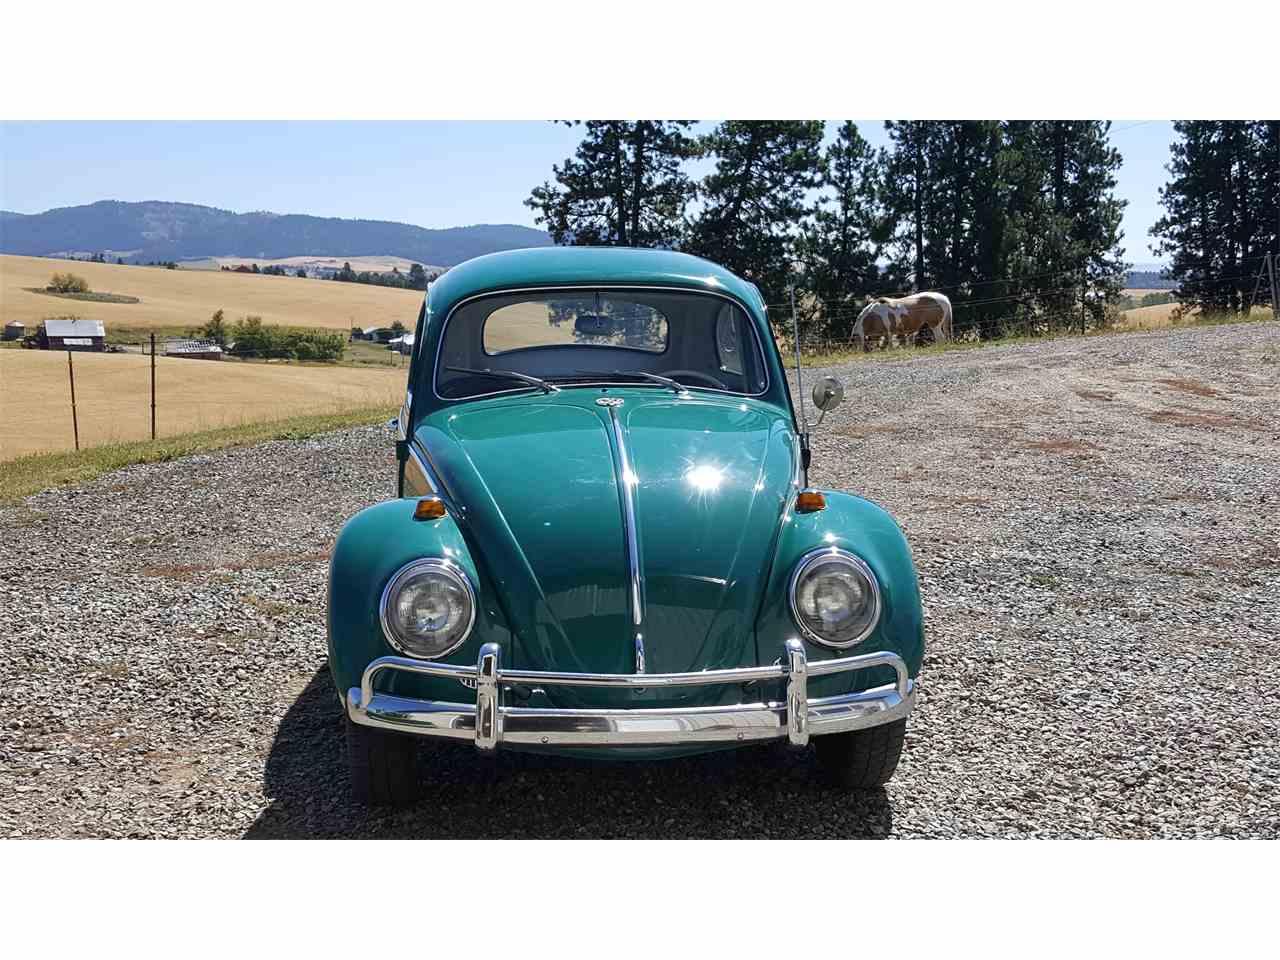 1964 Volkswagen Beetle for Sale | ClassicCars.com | CC-892245